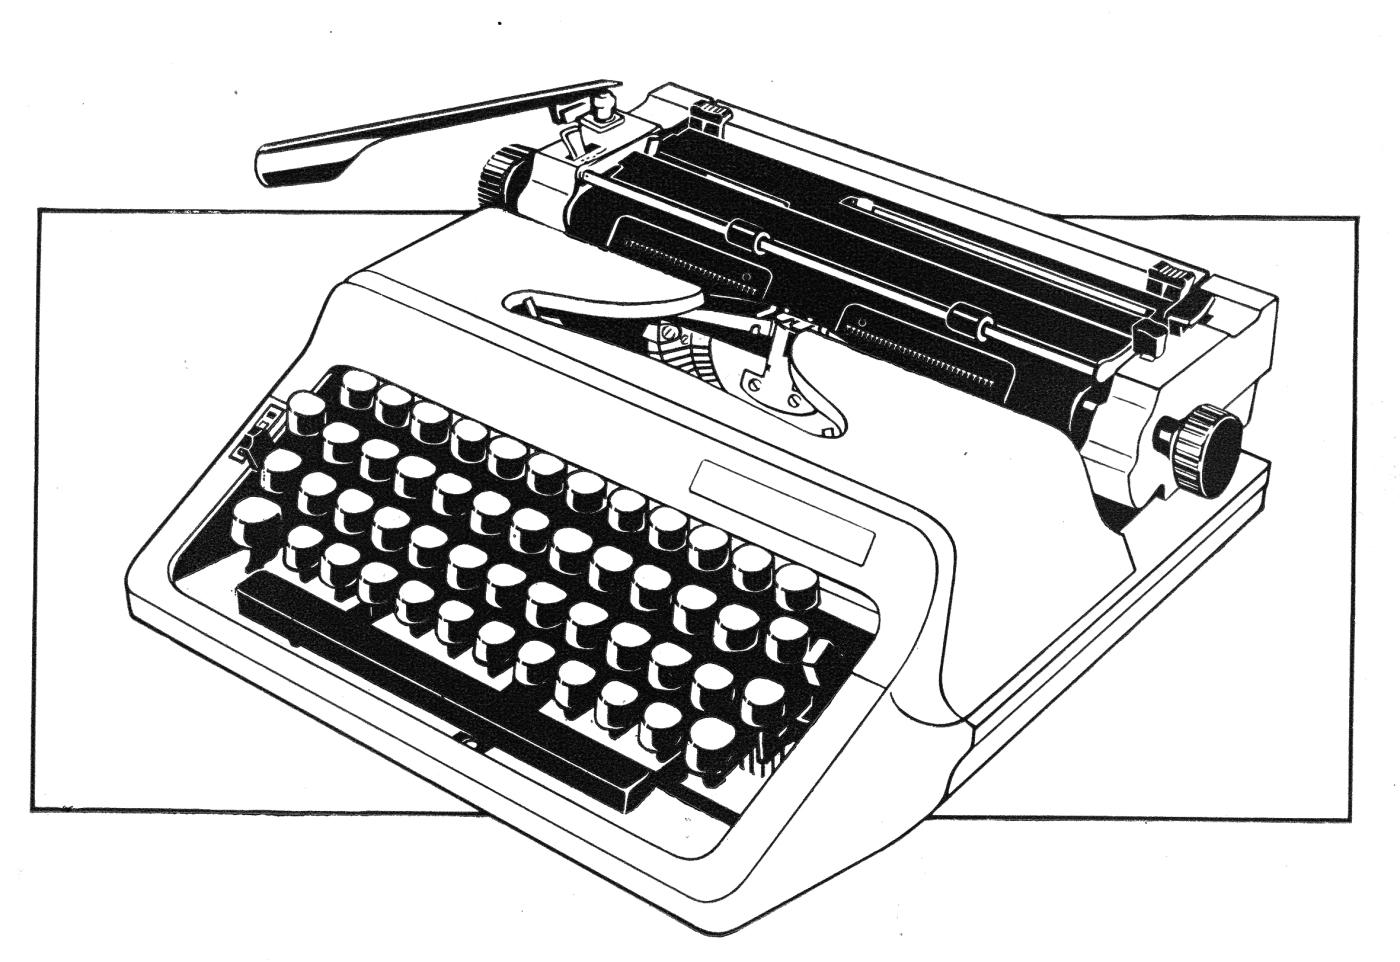 Optima Typewriter Image 01 small BW